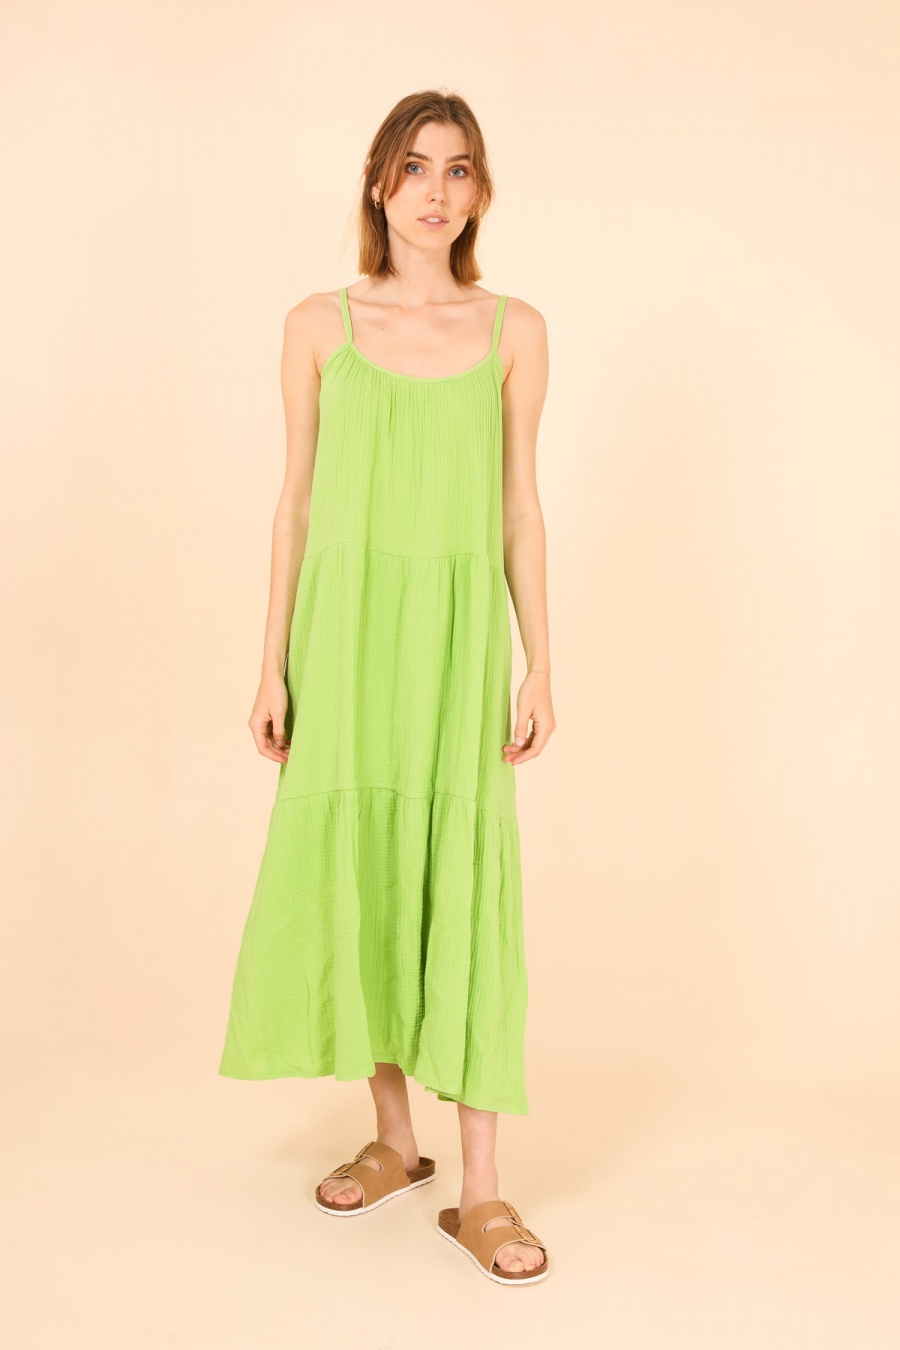 Robes longues Femme Vert fluo ELVIRA INDIANA #c eFashion Paris